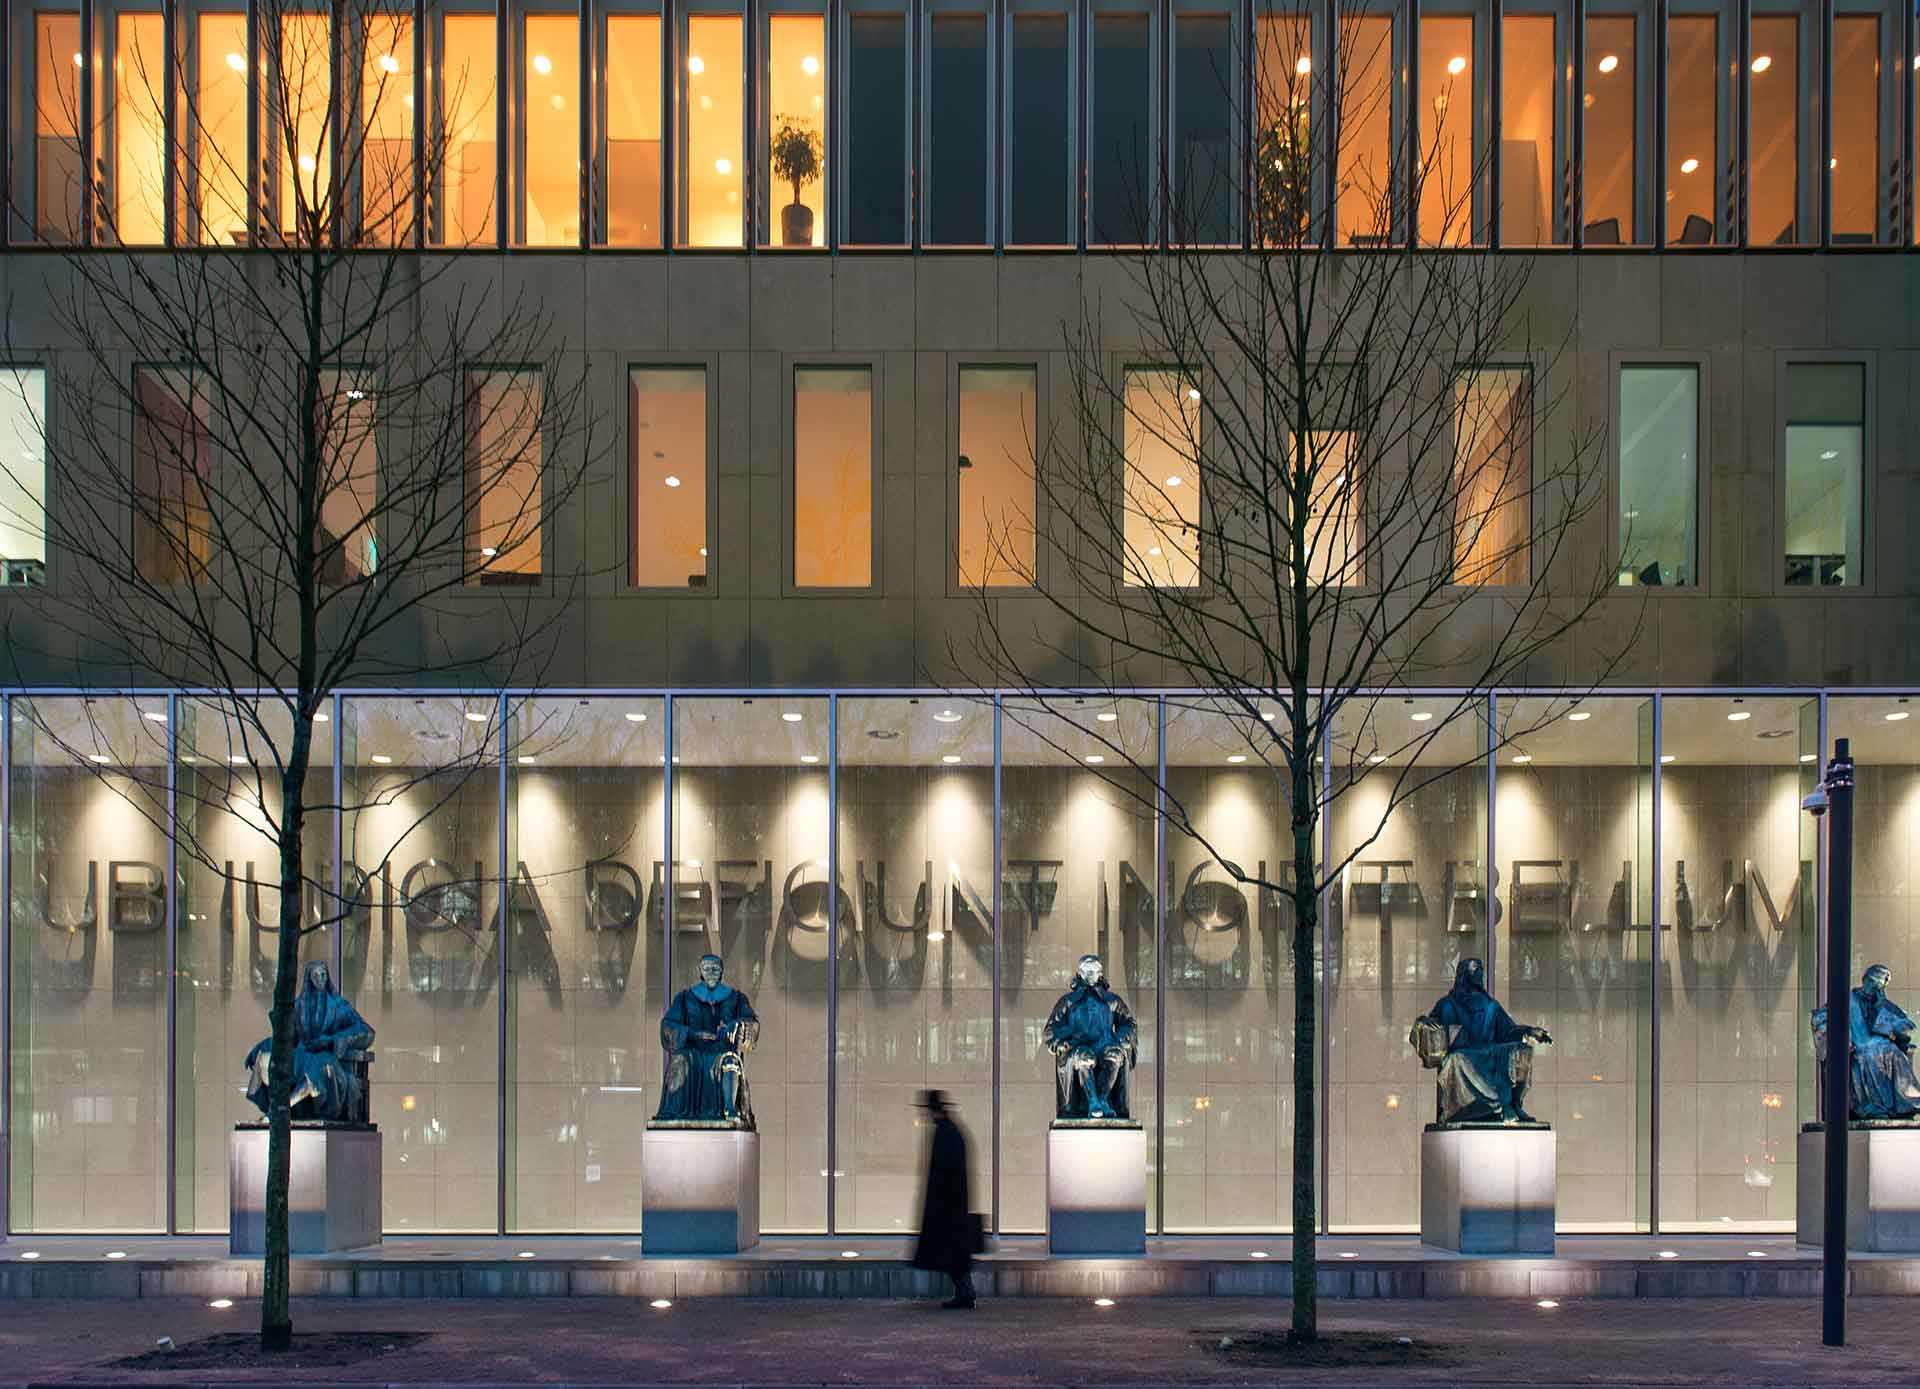 Rechtbank Midden-Nederland - Weening Strafrechtadvocaten